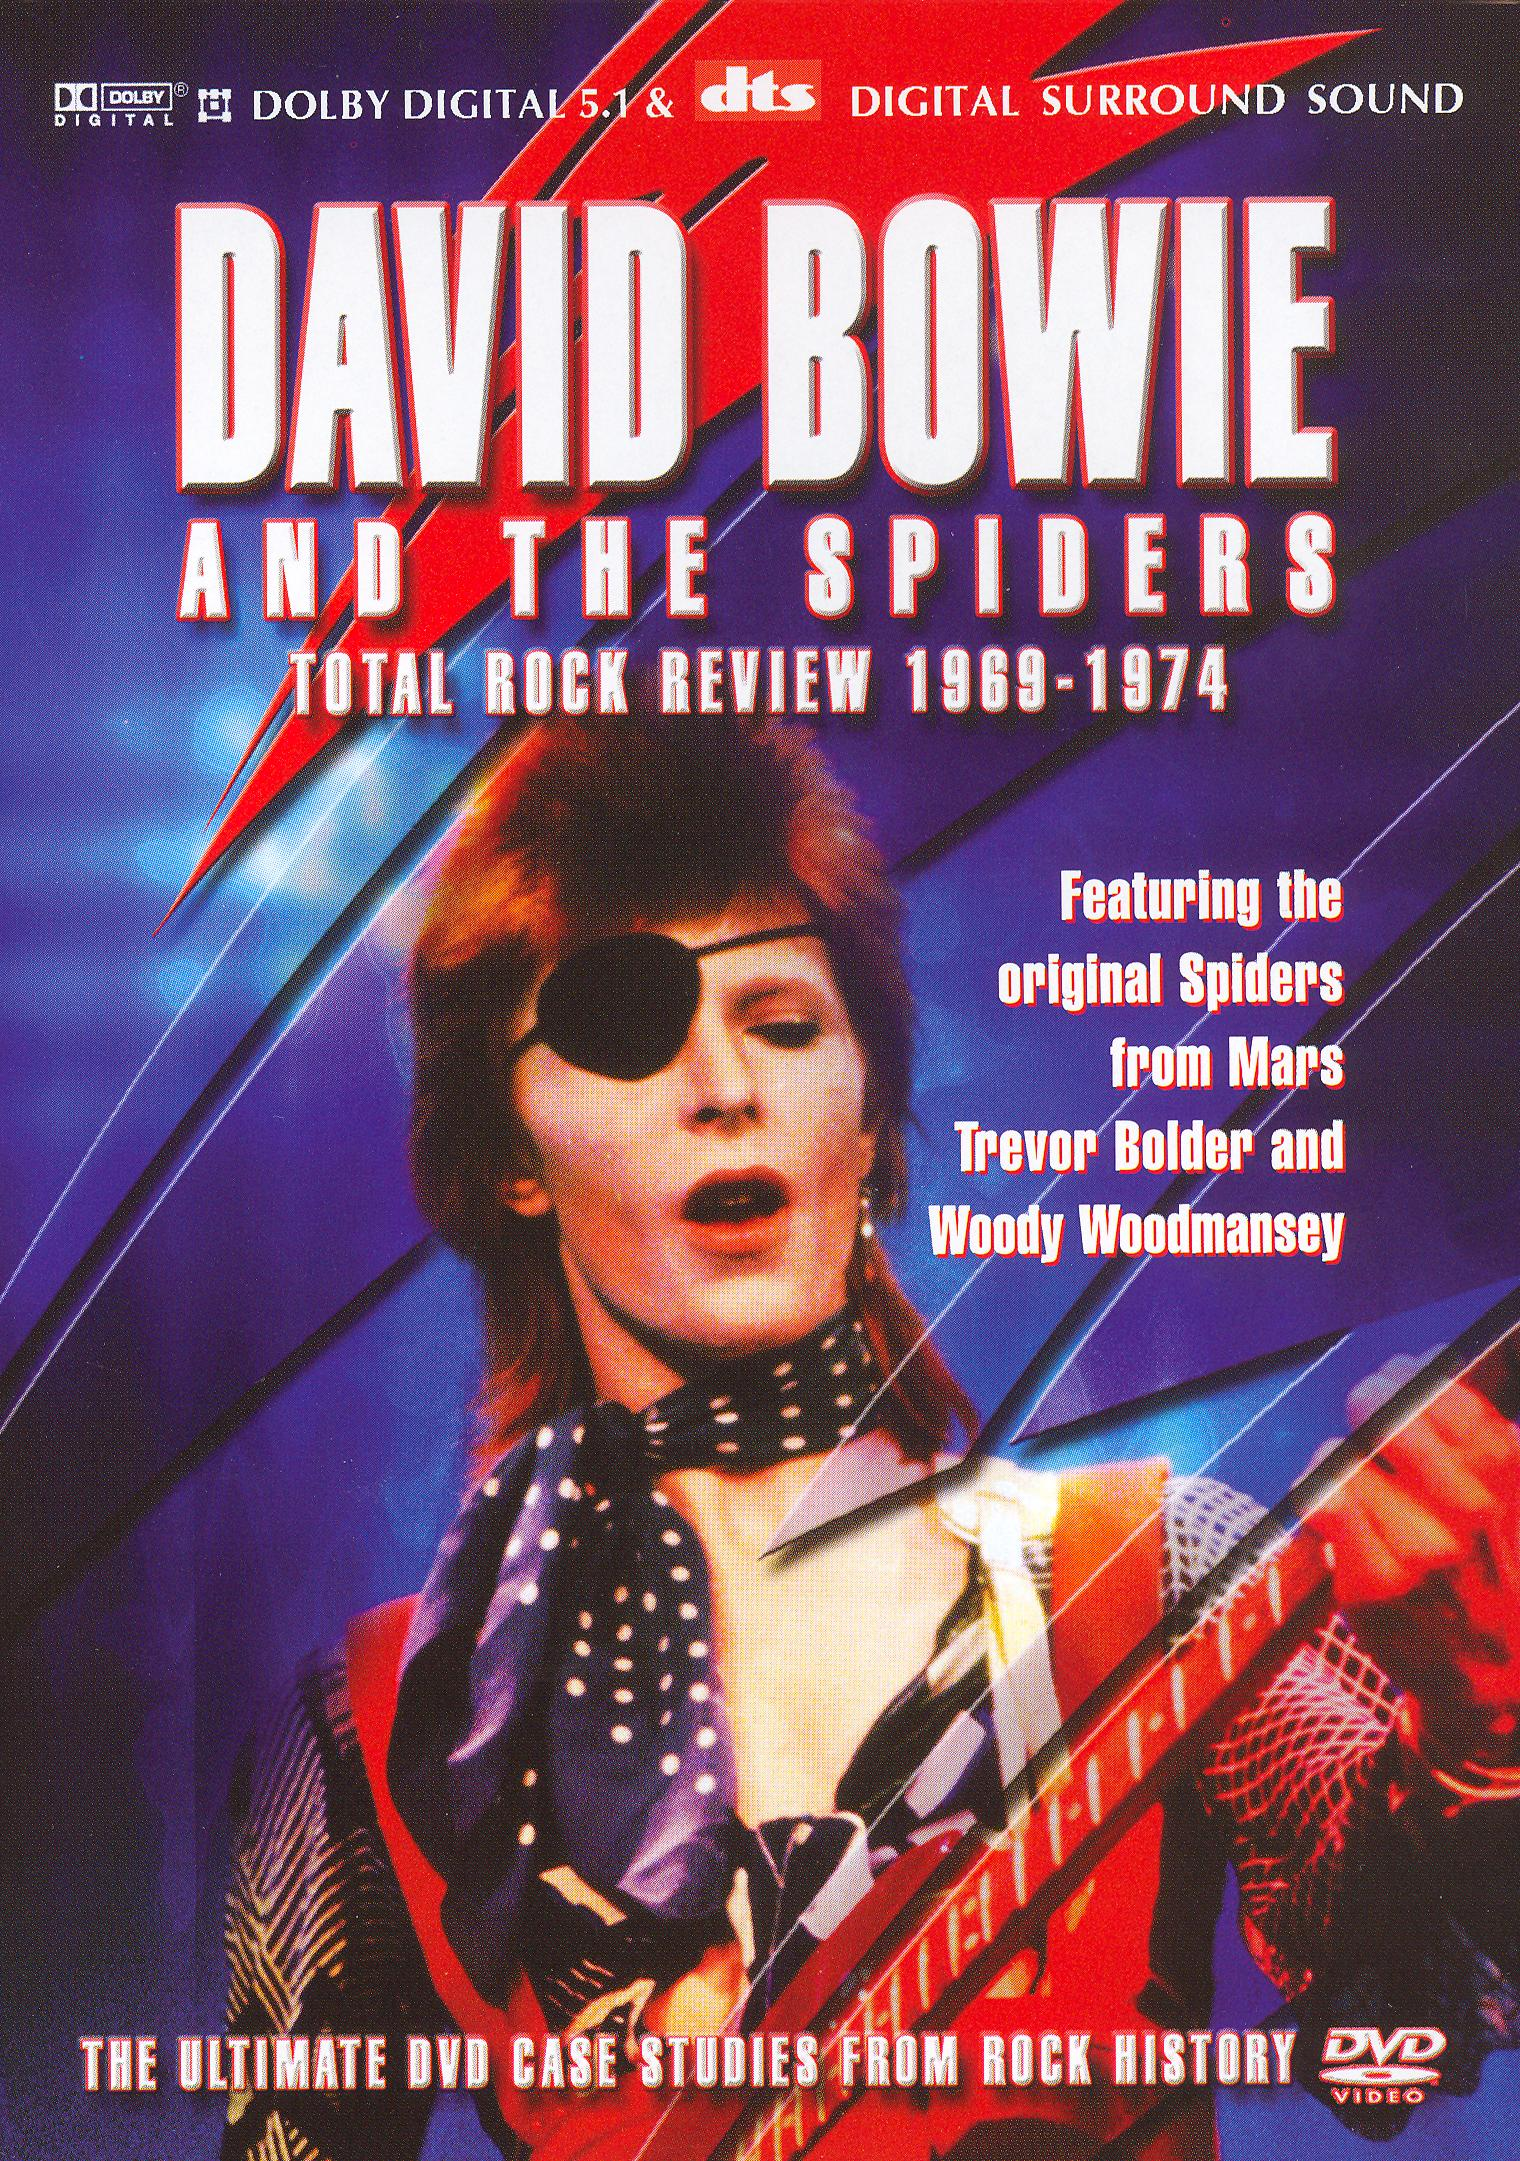 Total Rock Review: David Bowie